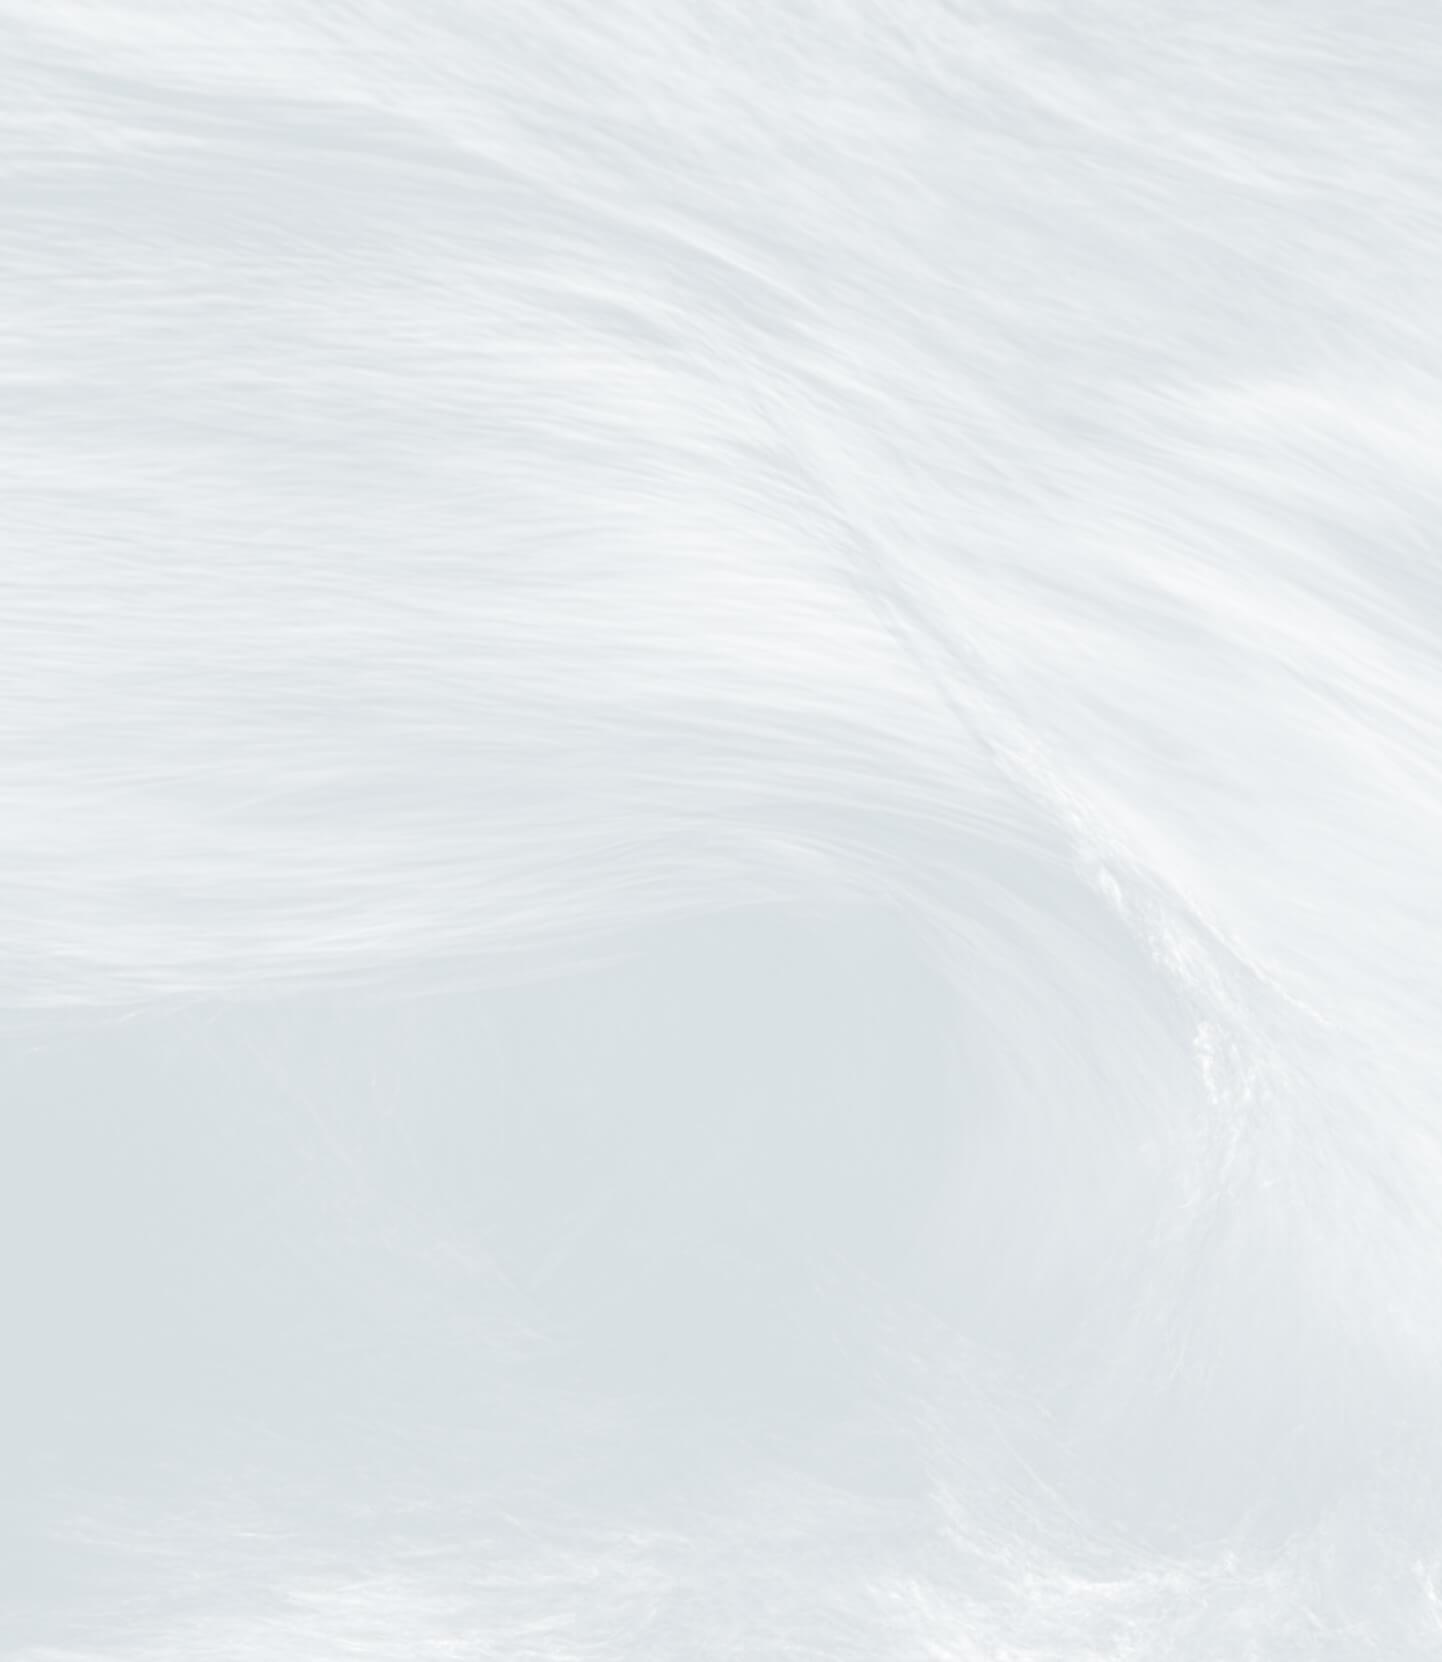 Background texture